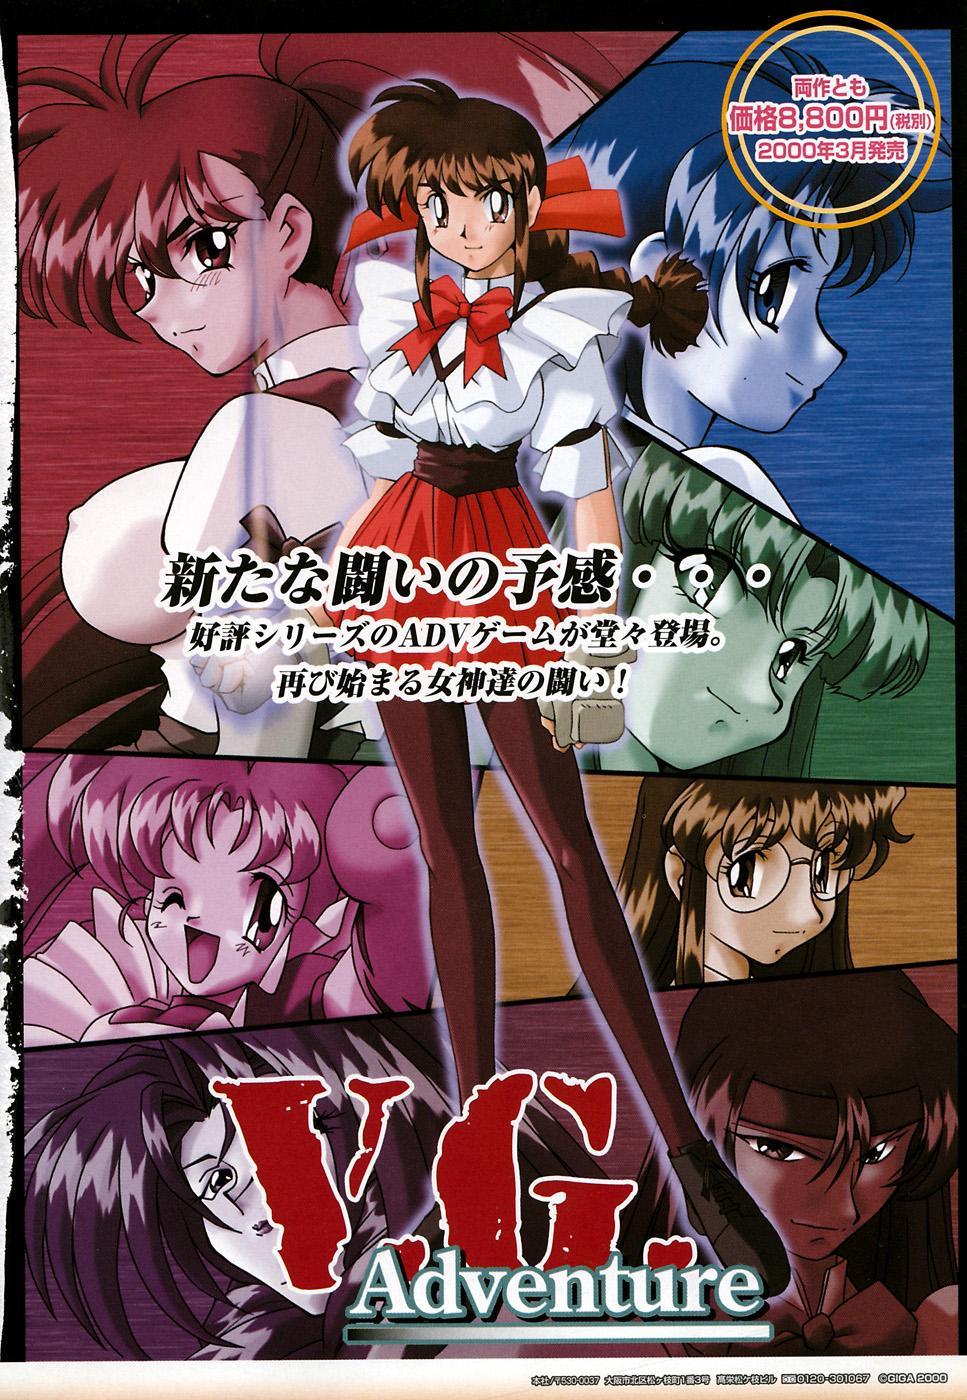 G-drive Vol.1 Ryoujokuhen 17